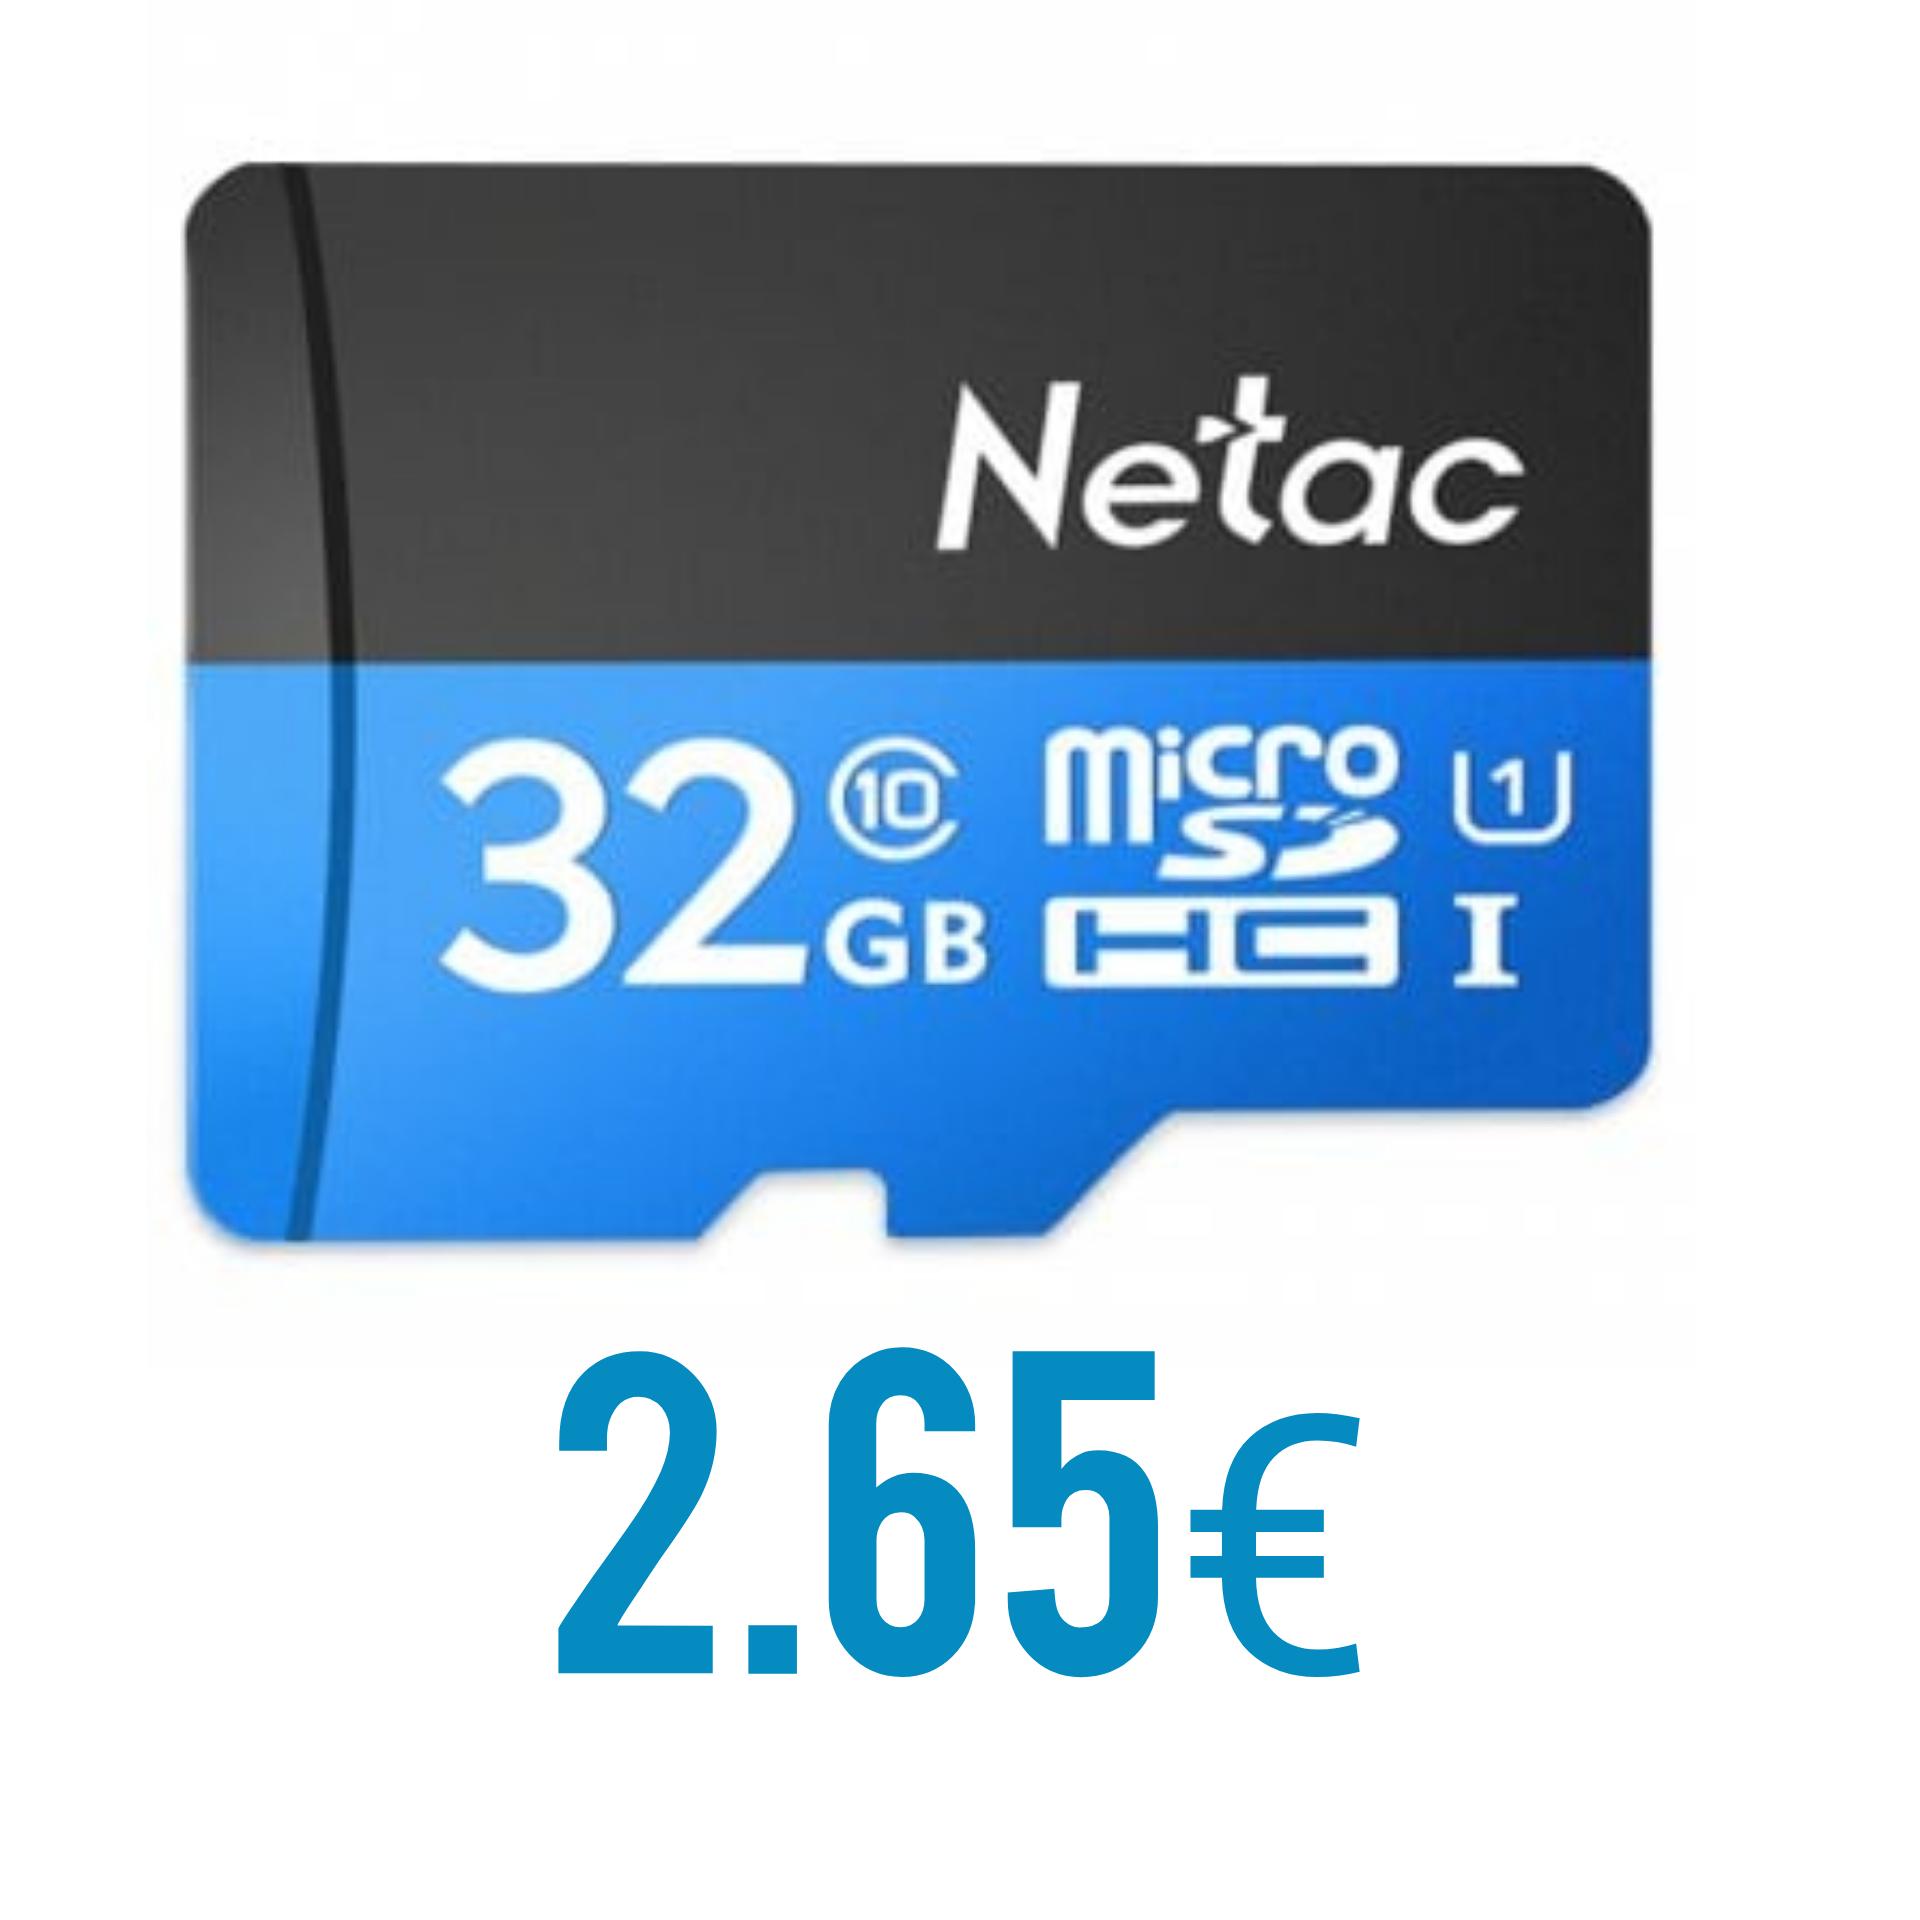 [Vuelve el ofertón] MicroSD Netac 32Gb - Clase 10